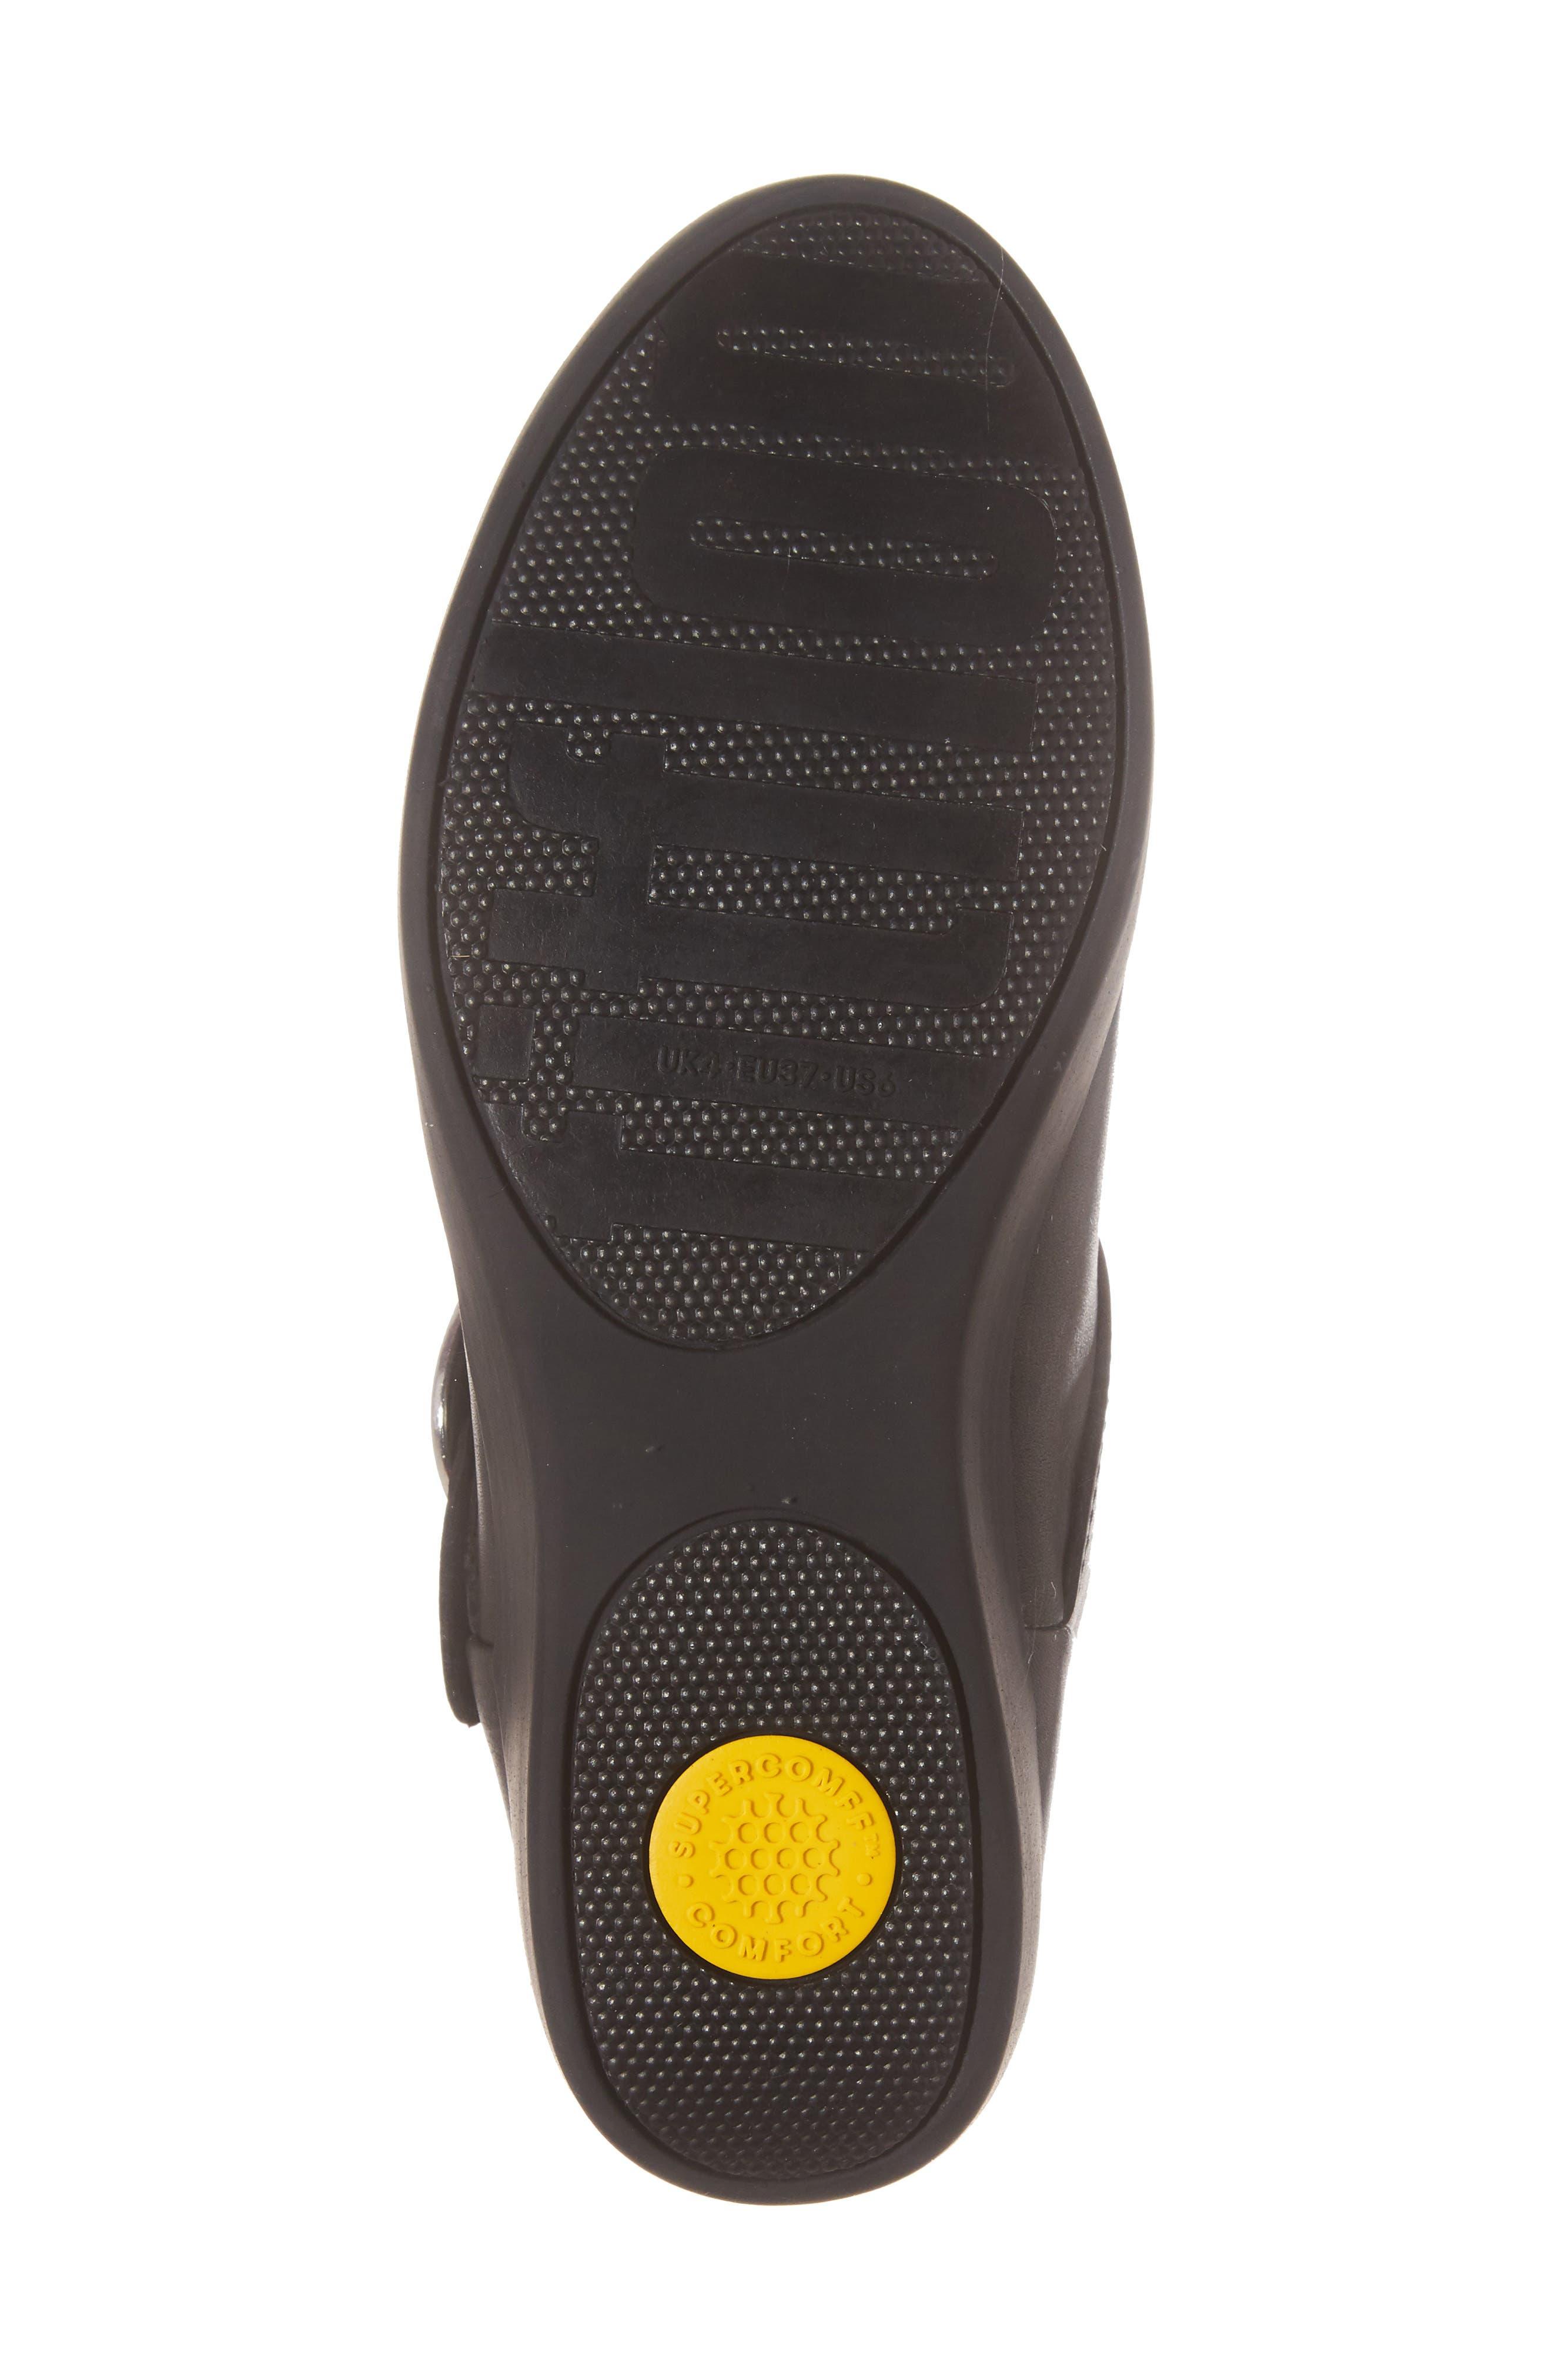 Superbuckle Chelsea Boot,                             Alternate thumbnail 6, color,                             Black